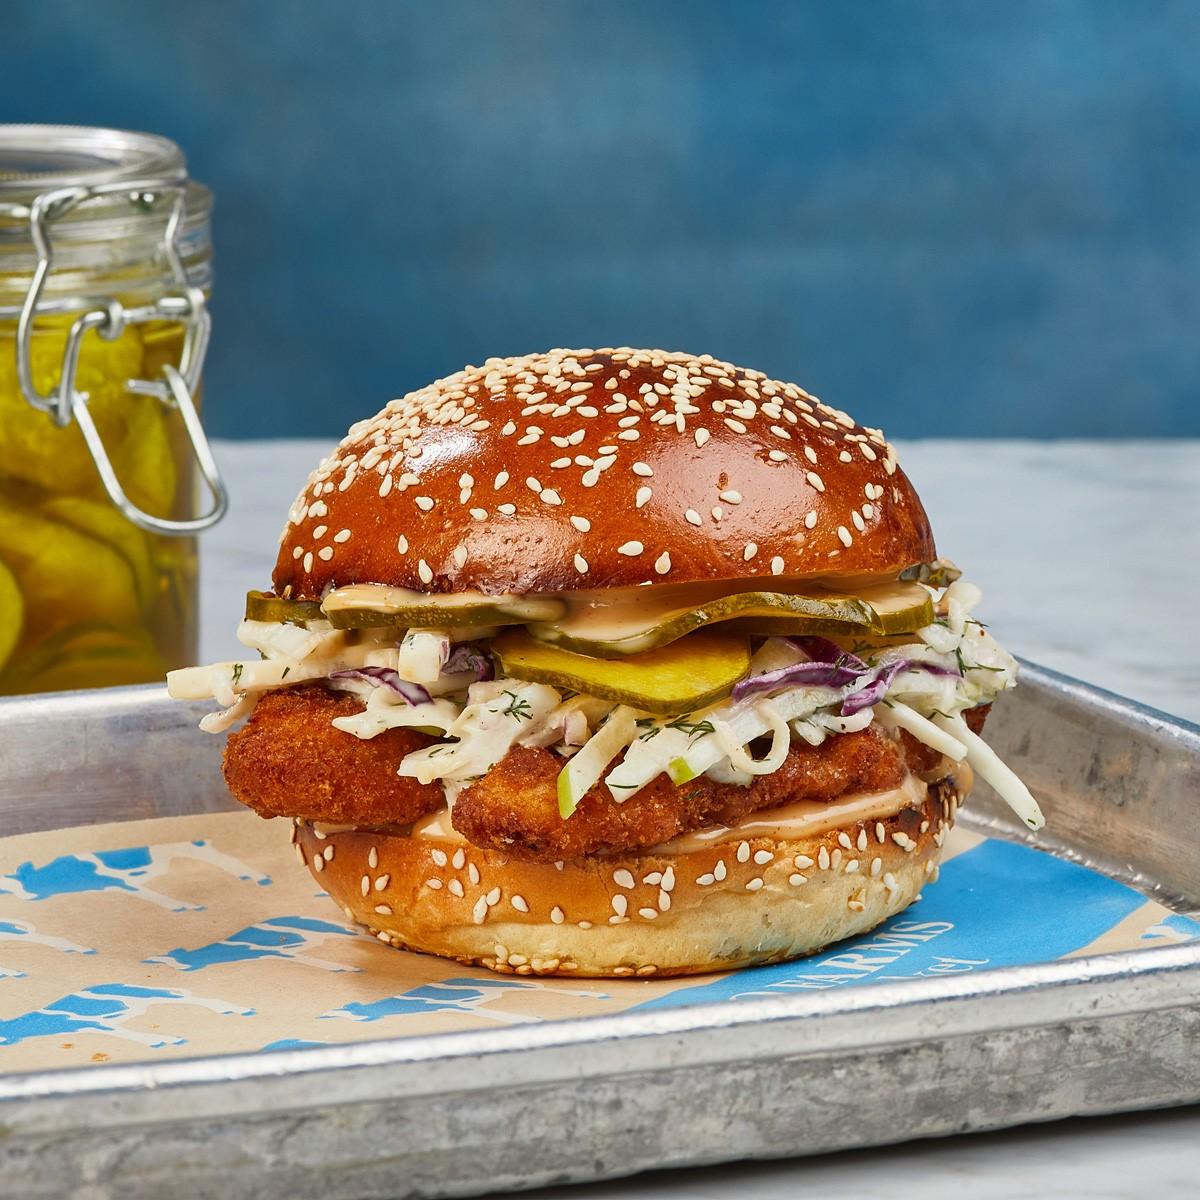 a crispy chicken sandwich with slaw and pickles on a pretzel bun